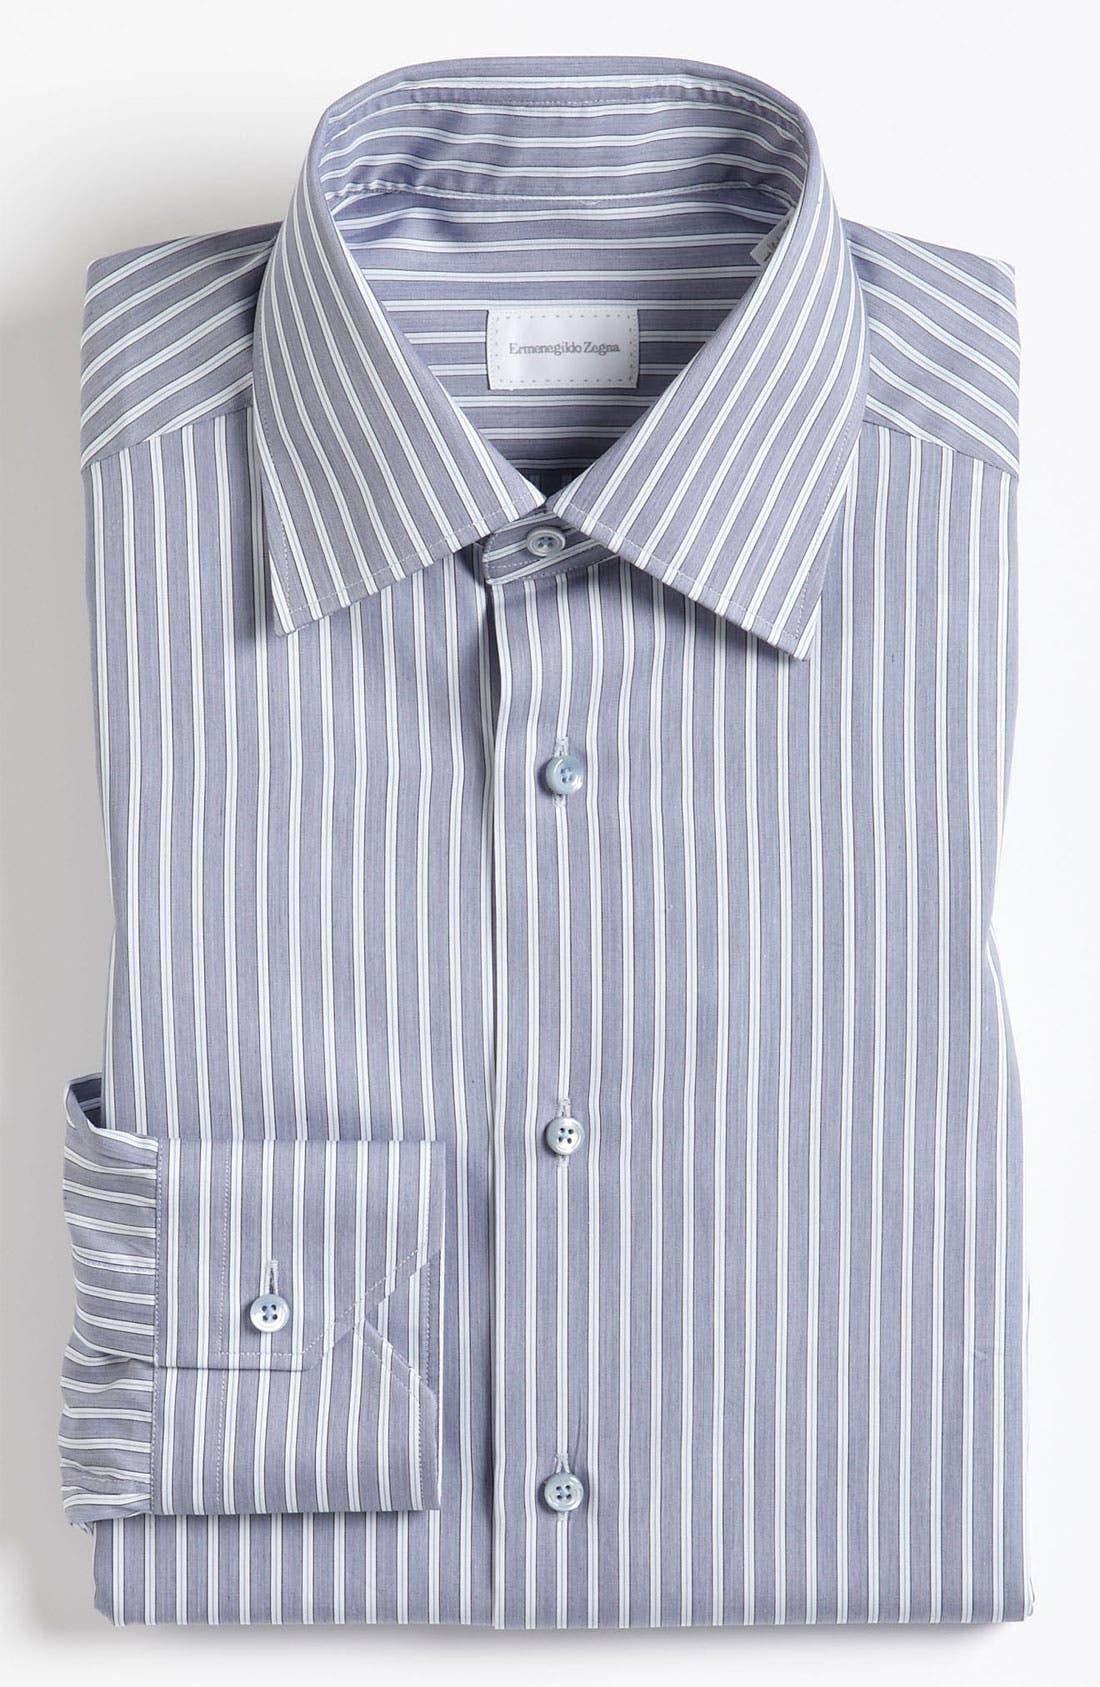 Main Image - Ermenegildo Zegna Tailored Fit Dress Shirt